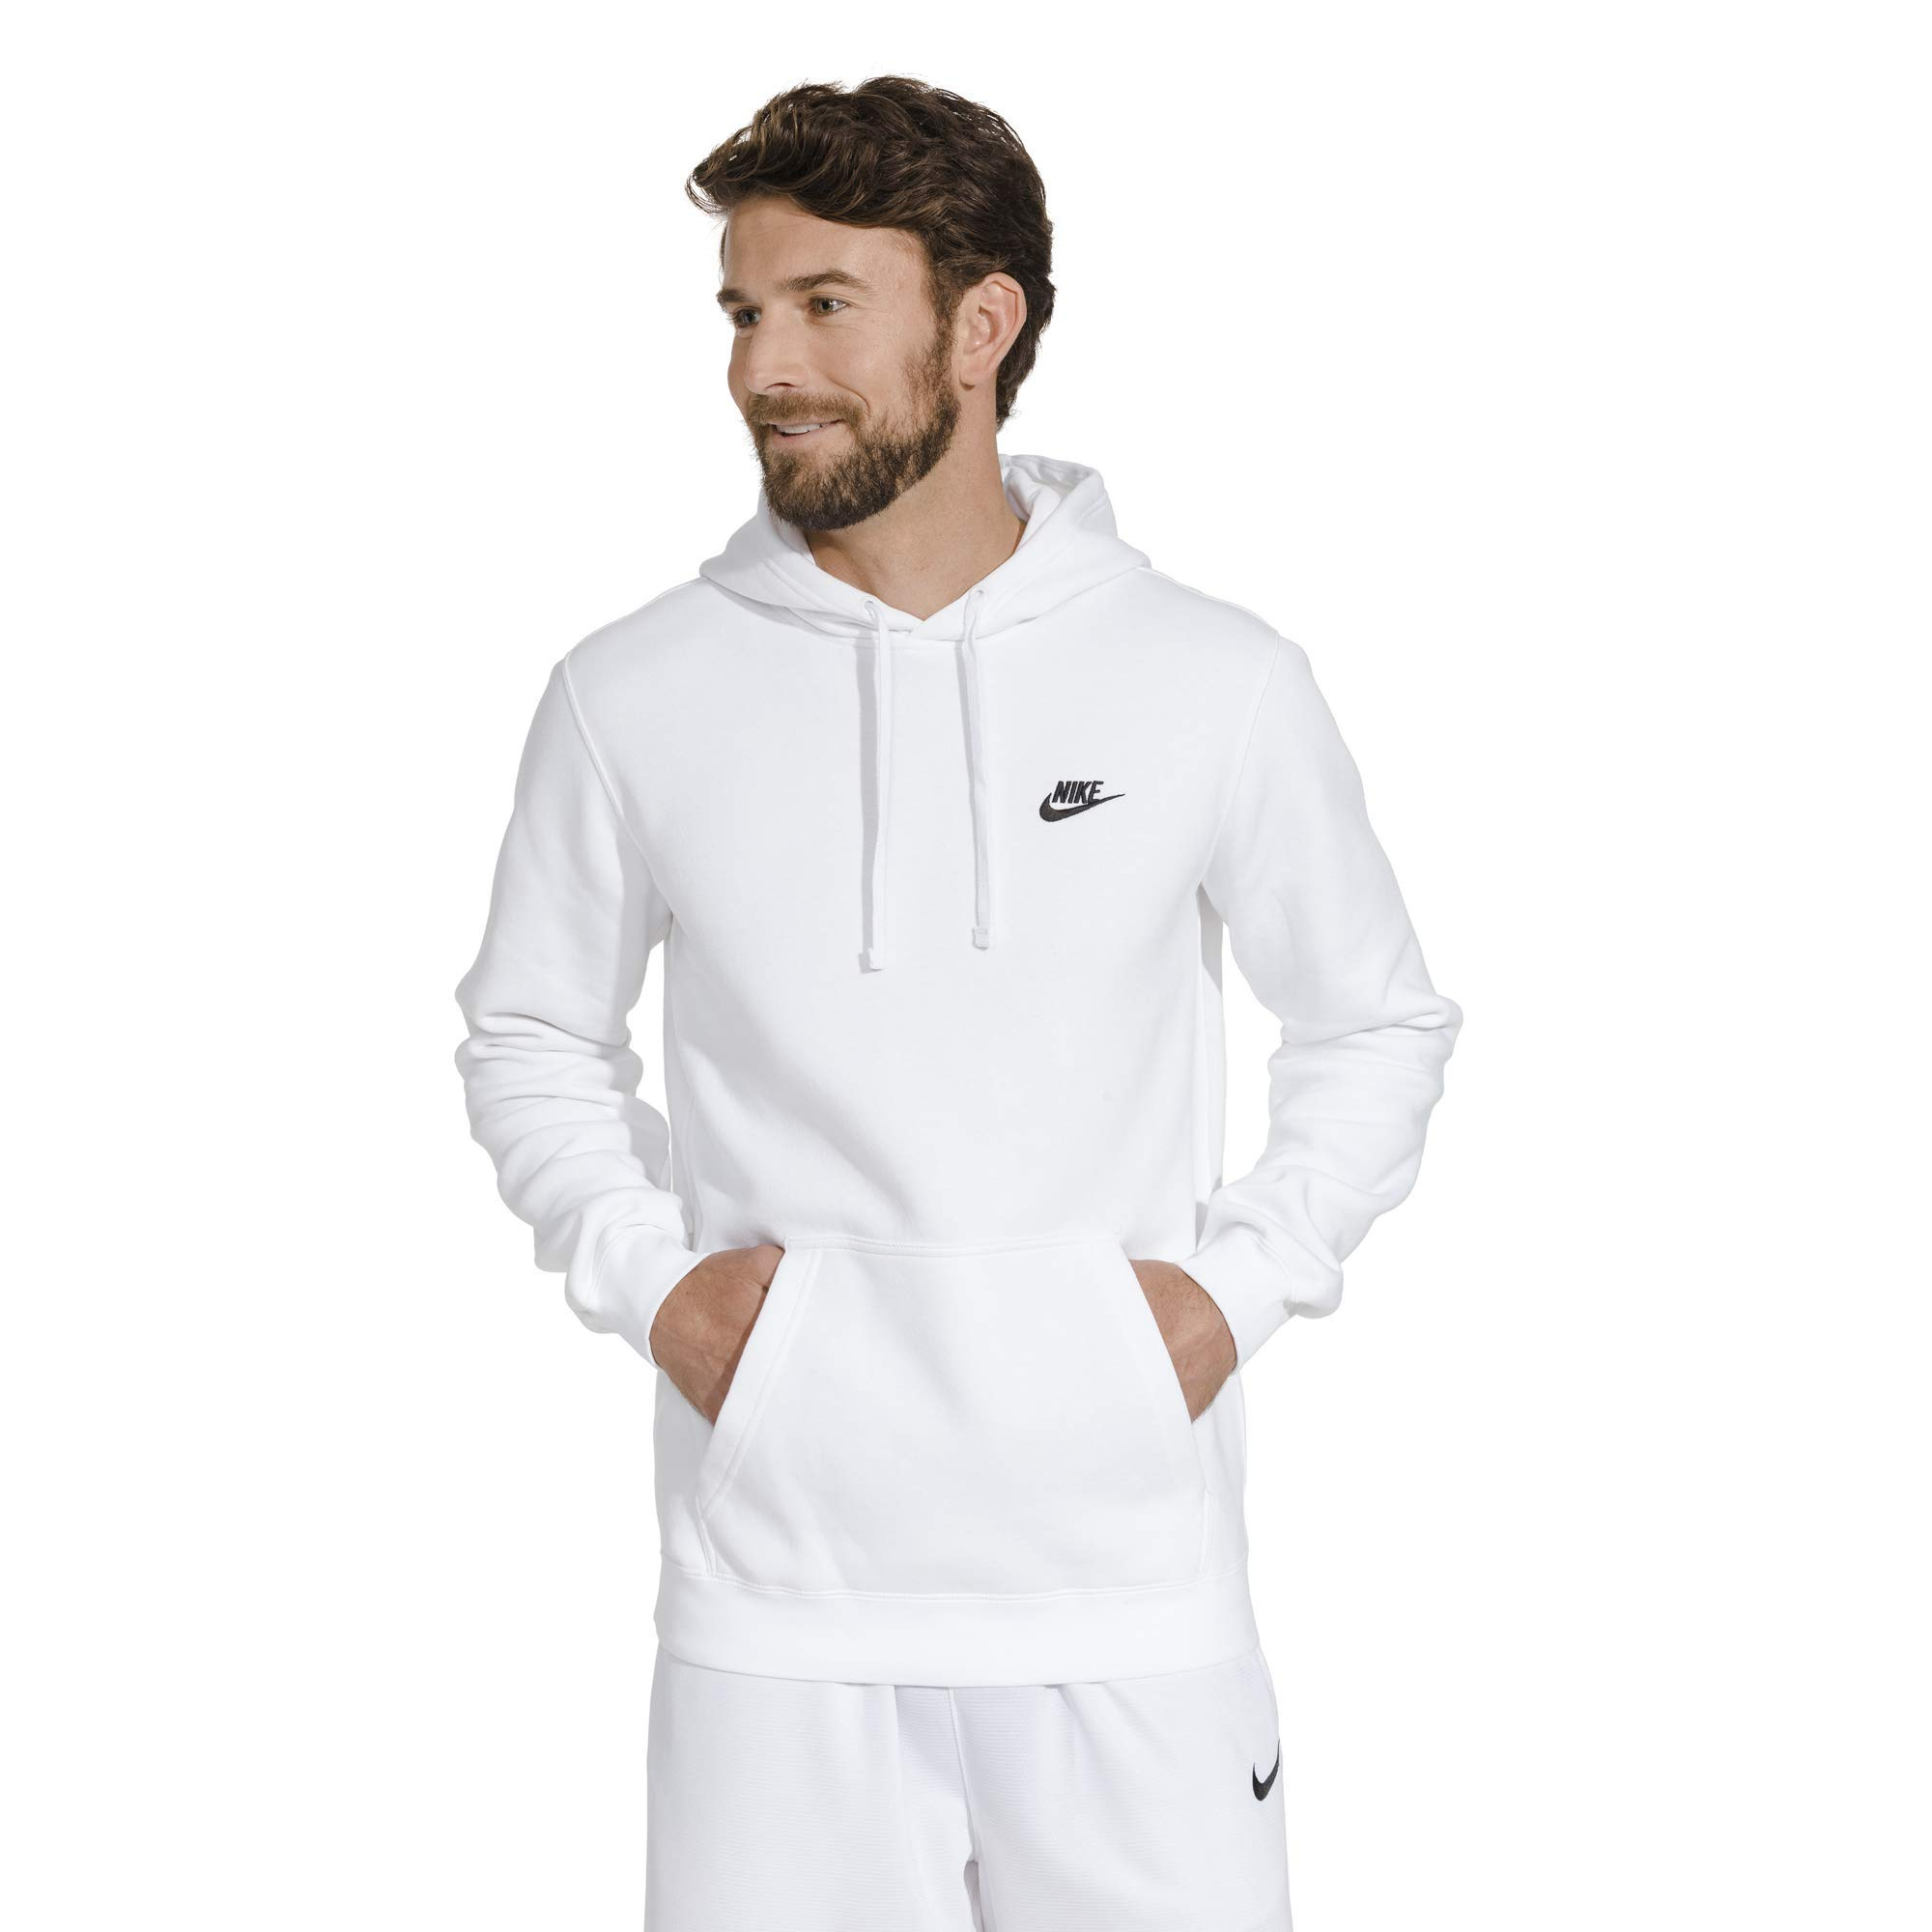 Men's Nike Sportswear Club Pullover Hoodie, Fleece Sweatshirt for Men with Paneled Hood, White/White/Black, 4XL-T